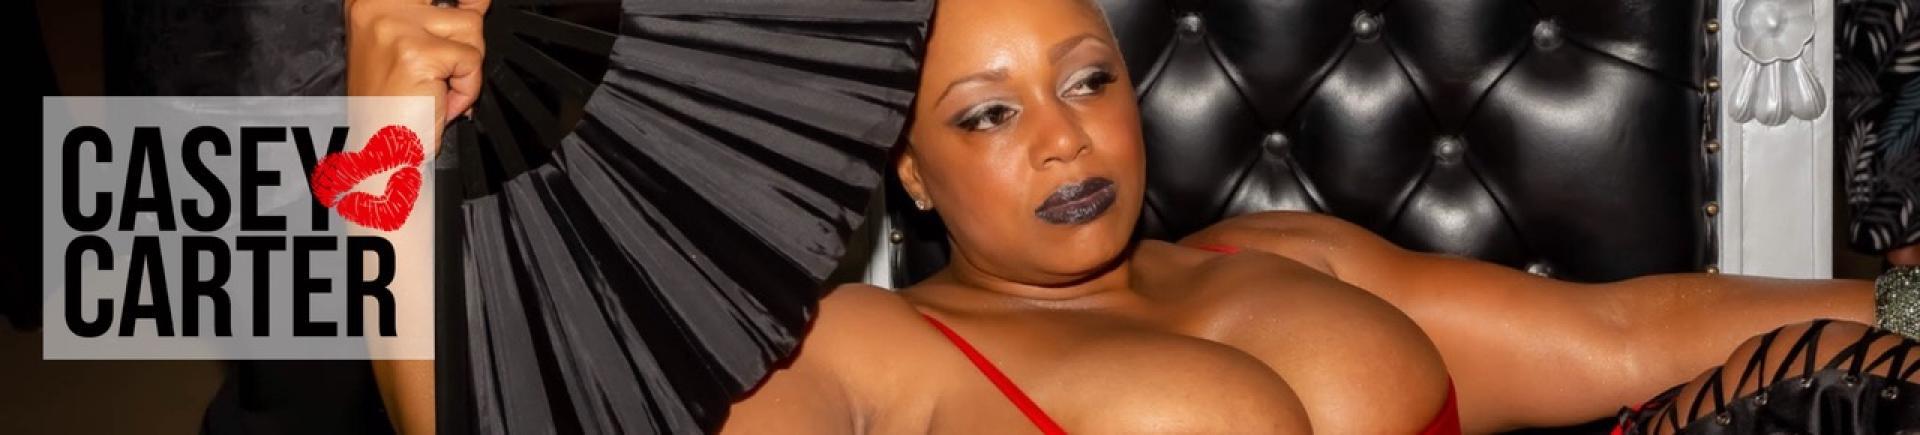 ASN Lifestyle Magazine Casey Carter Sex Educator Erotic Adult Entertainer